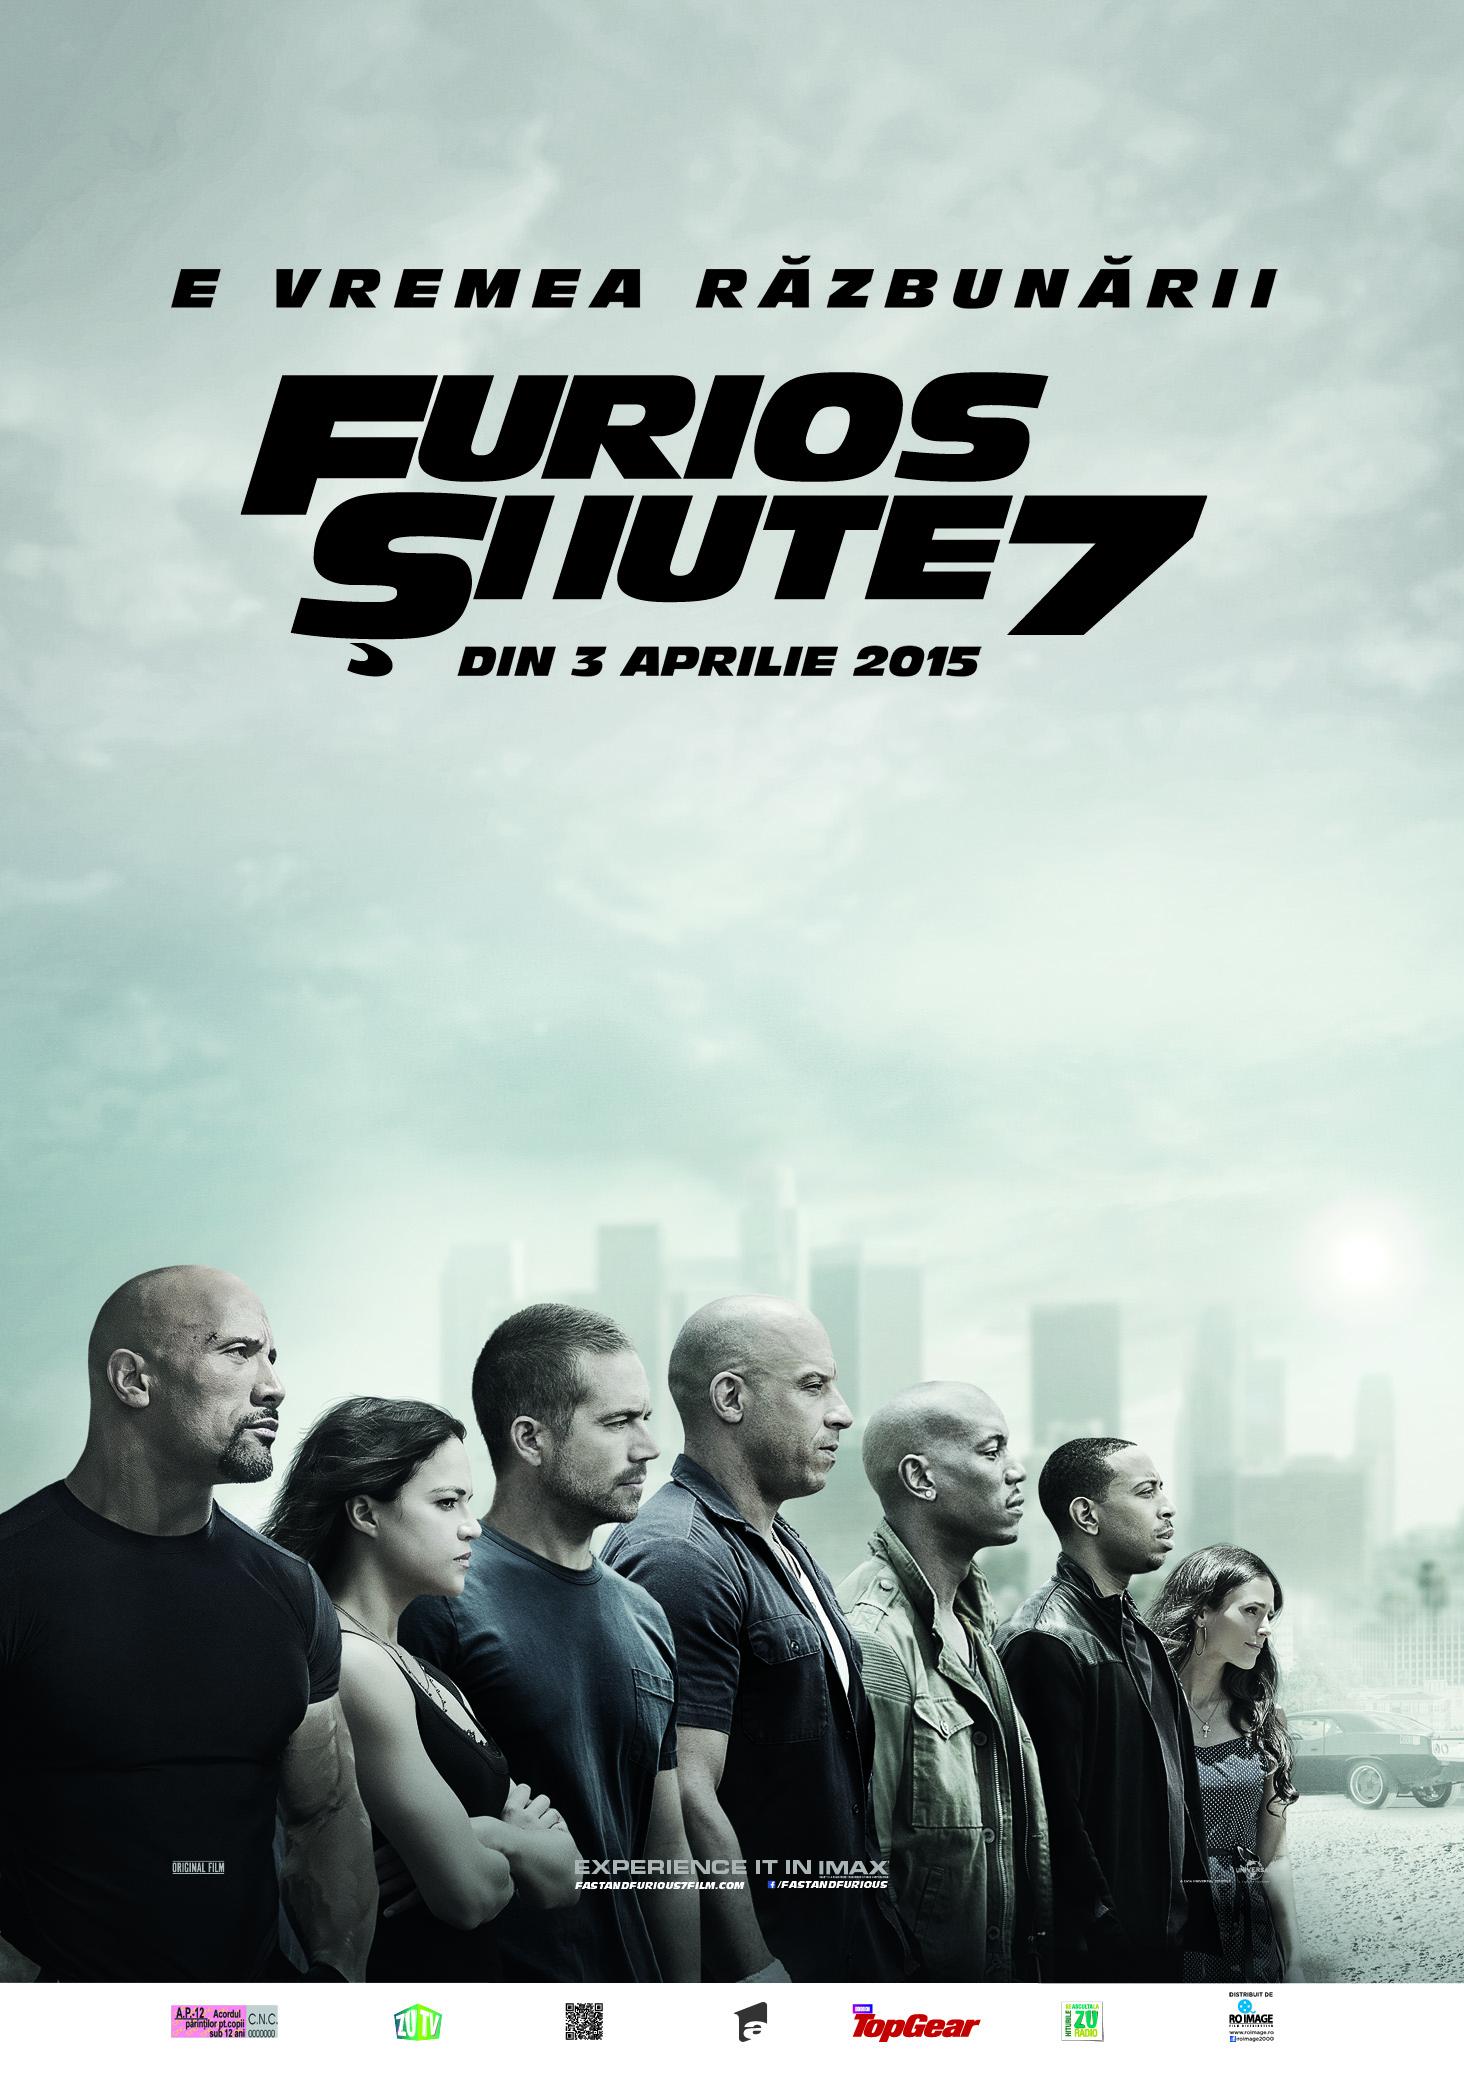 Furios si iute 7 / Fast and Furious 7 (Avanpremiera)